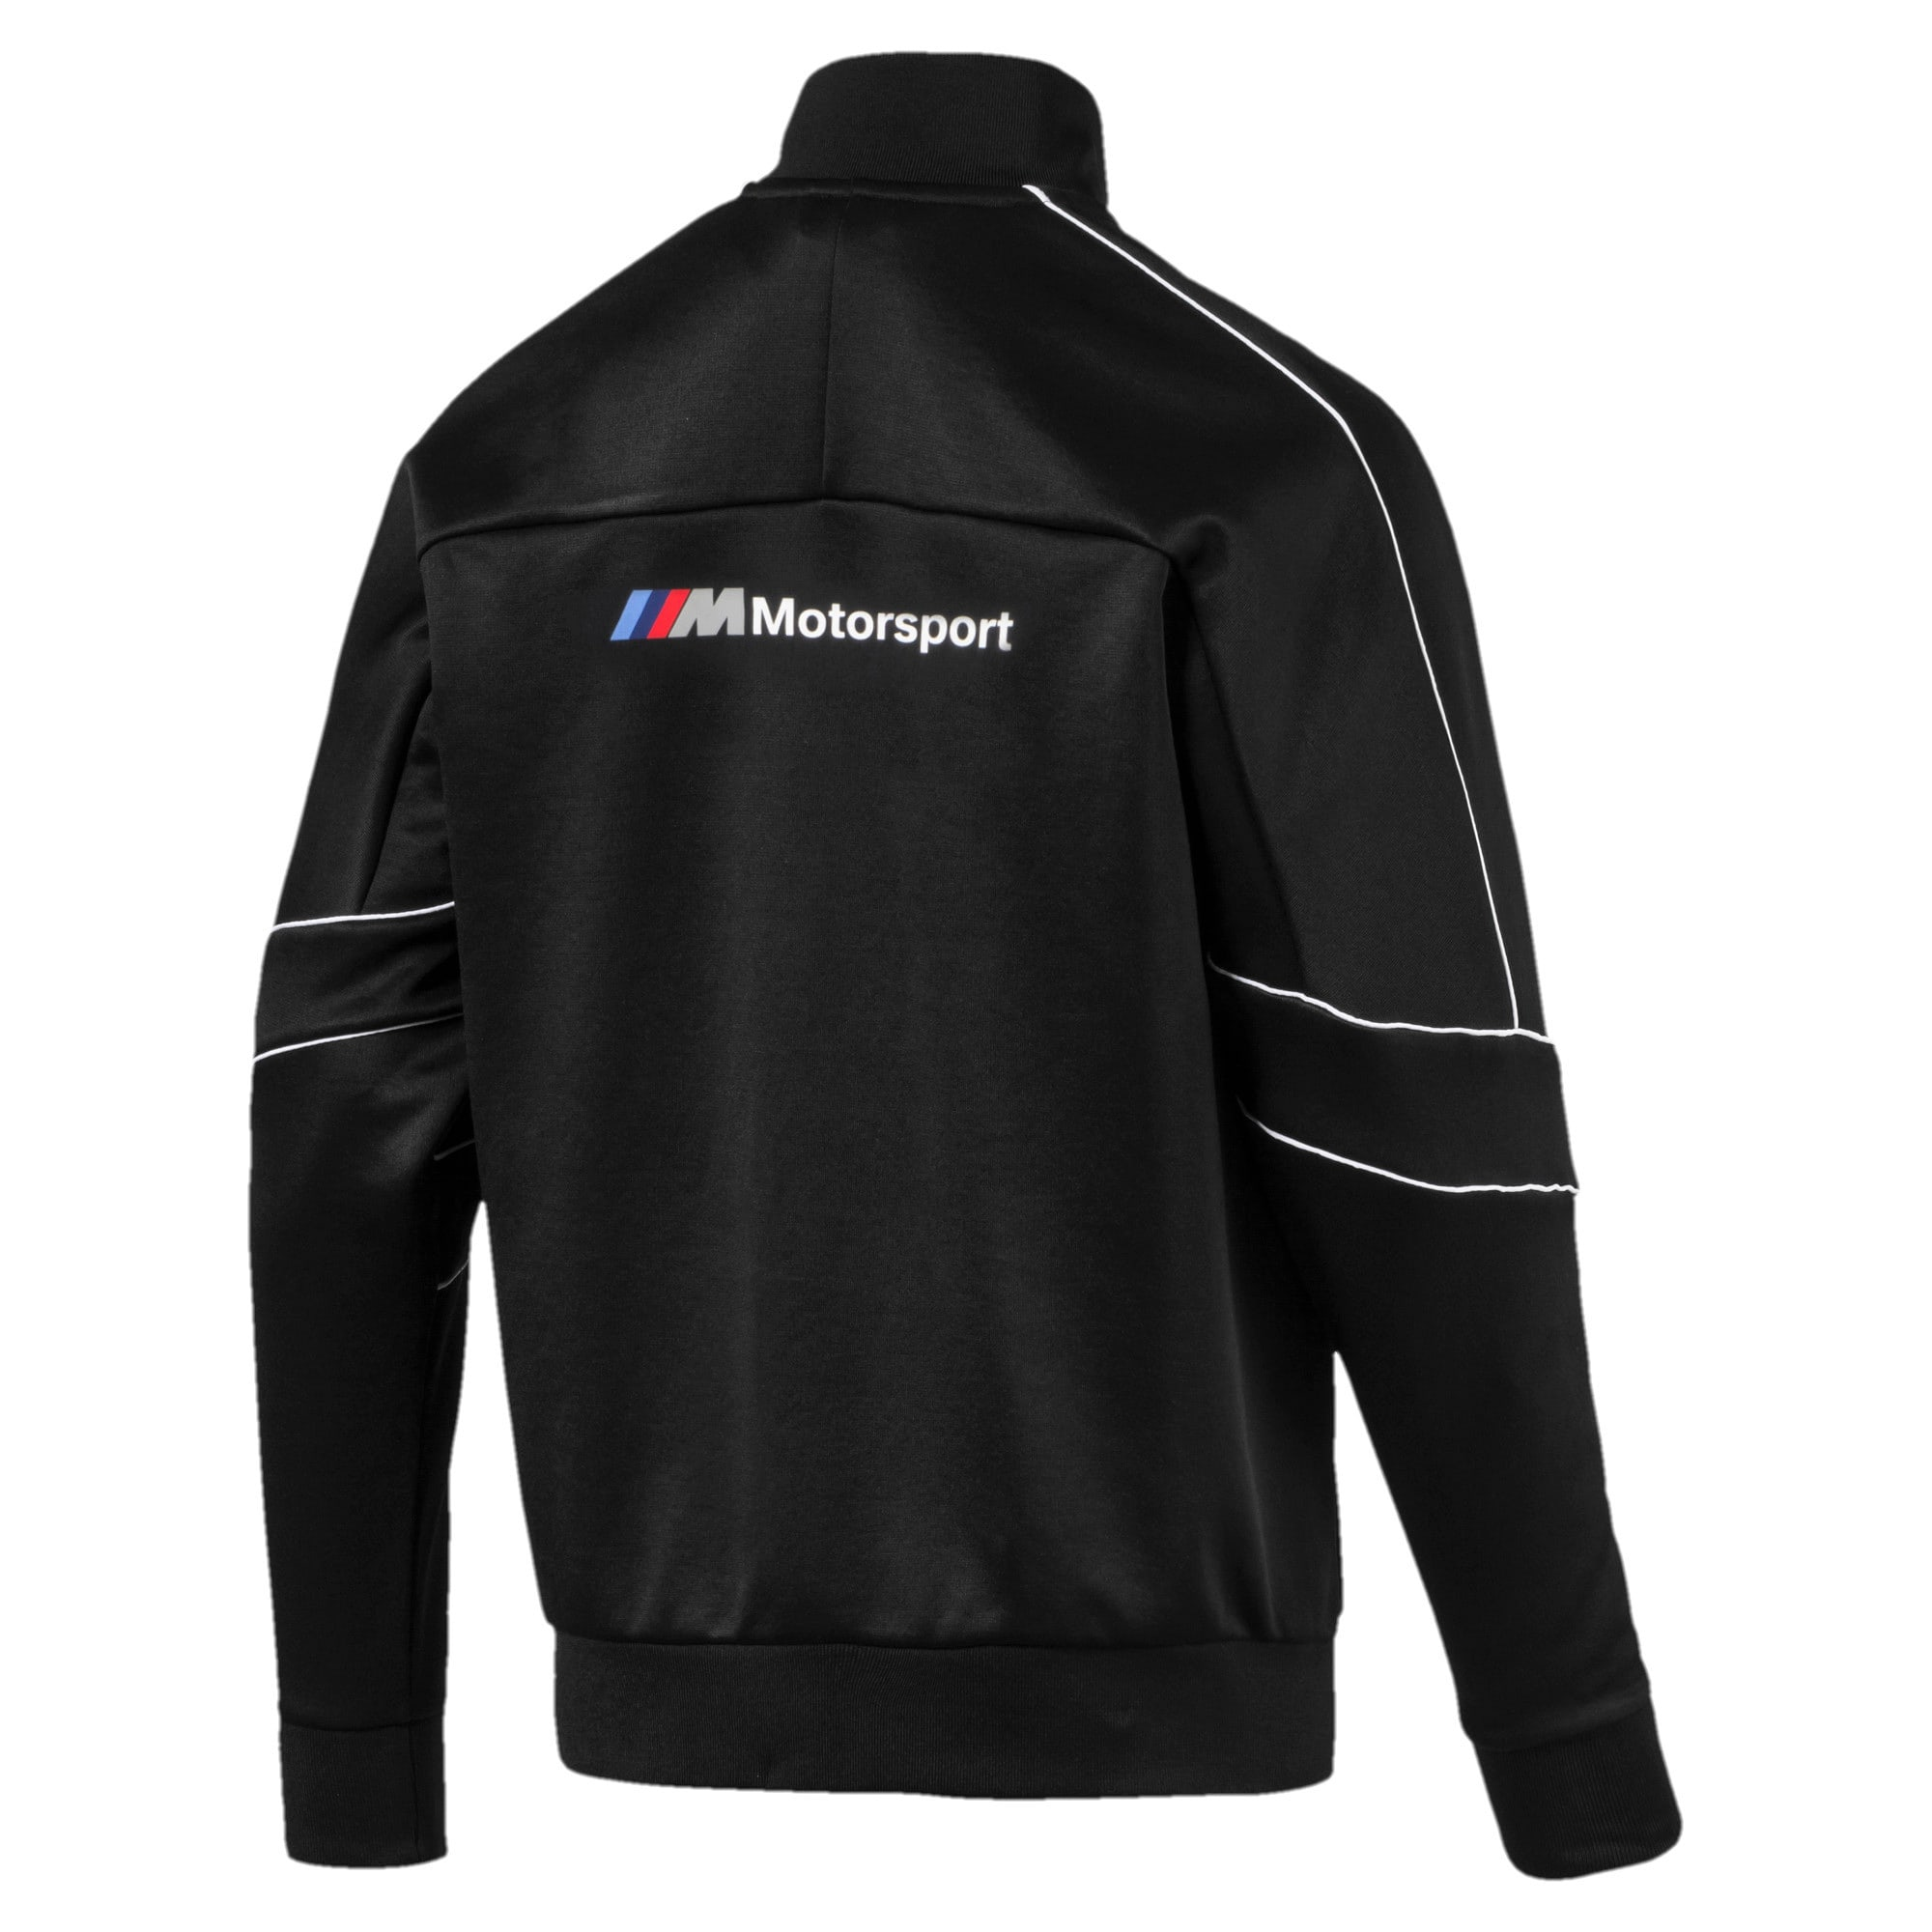 Thumbnail 2 of BMW M Motorsports T7 Track Men's Jacket, Puma Black, medium-IND